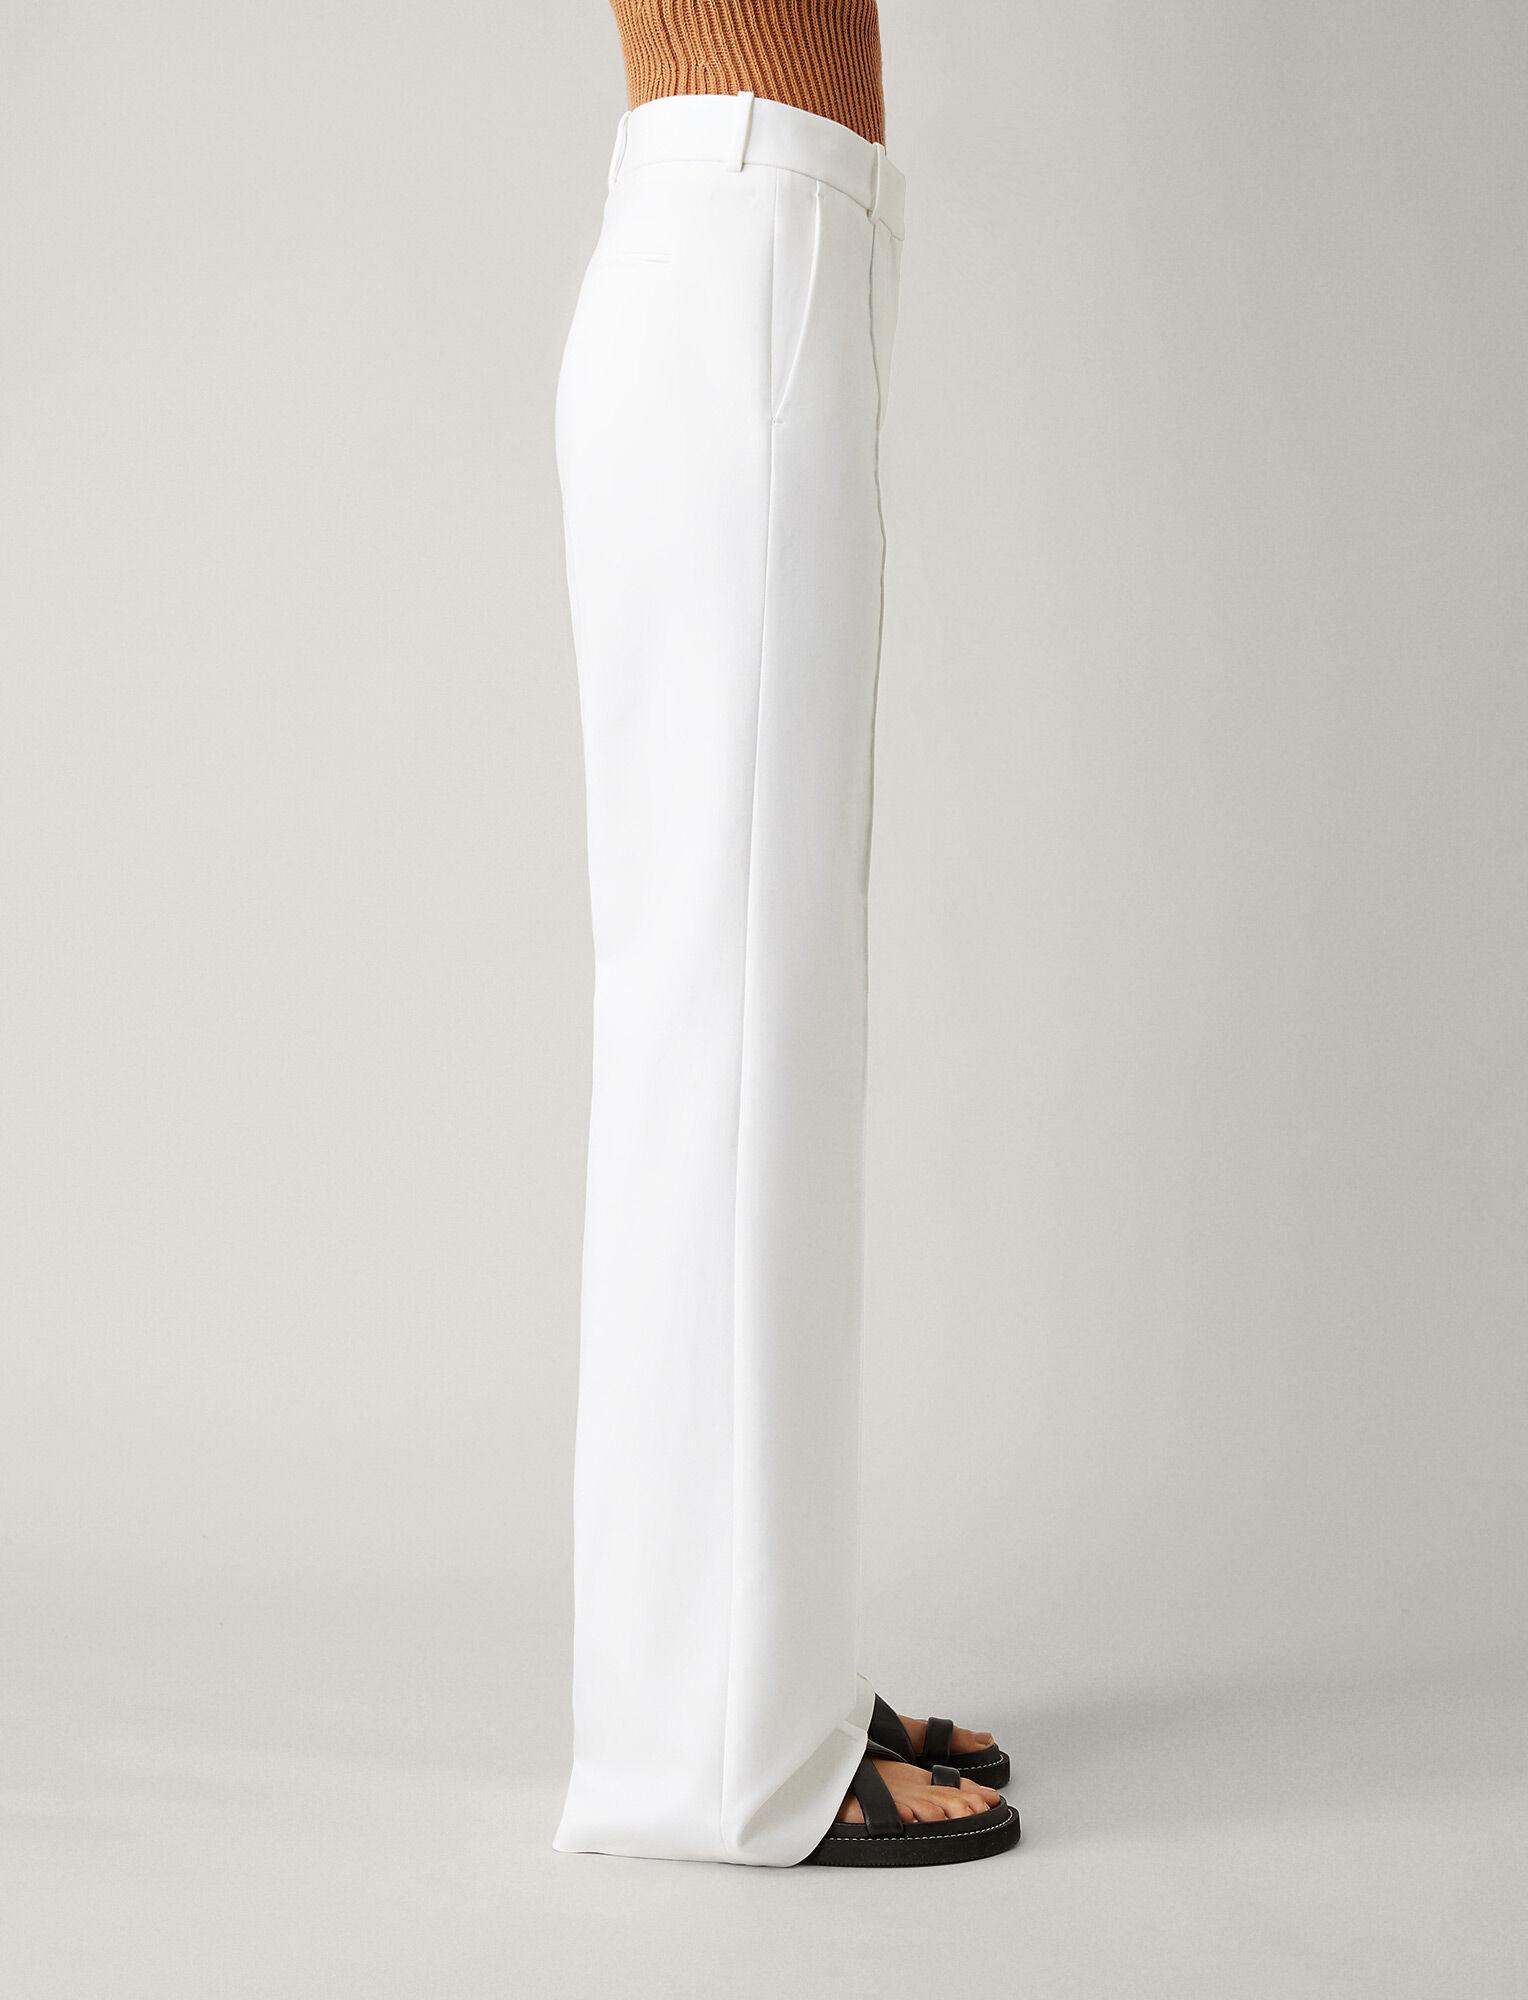 Joseph, Richard Double Cotton Stretch Trousers, in WHITE